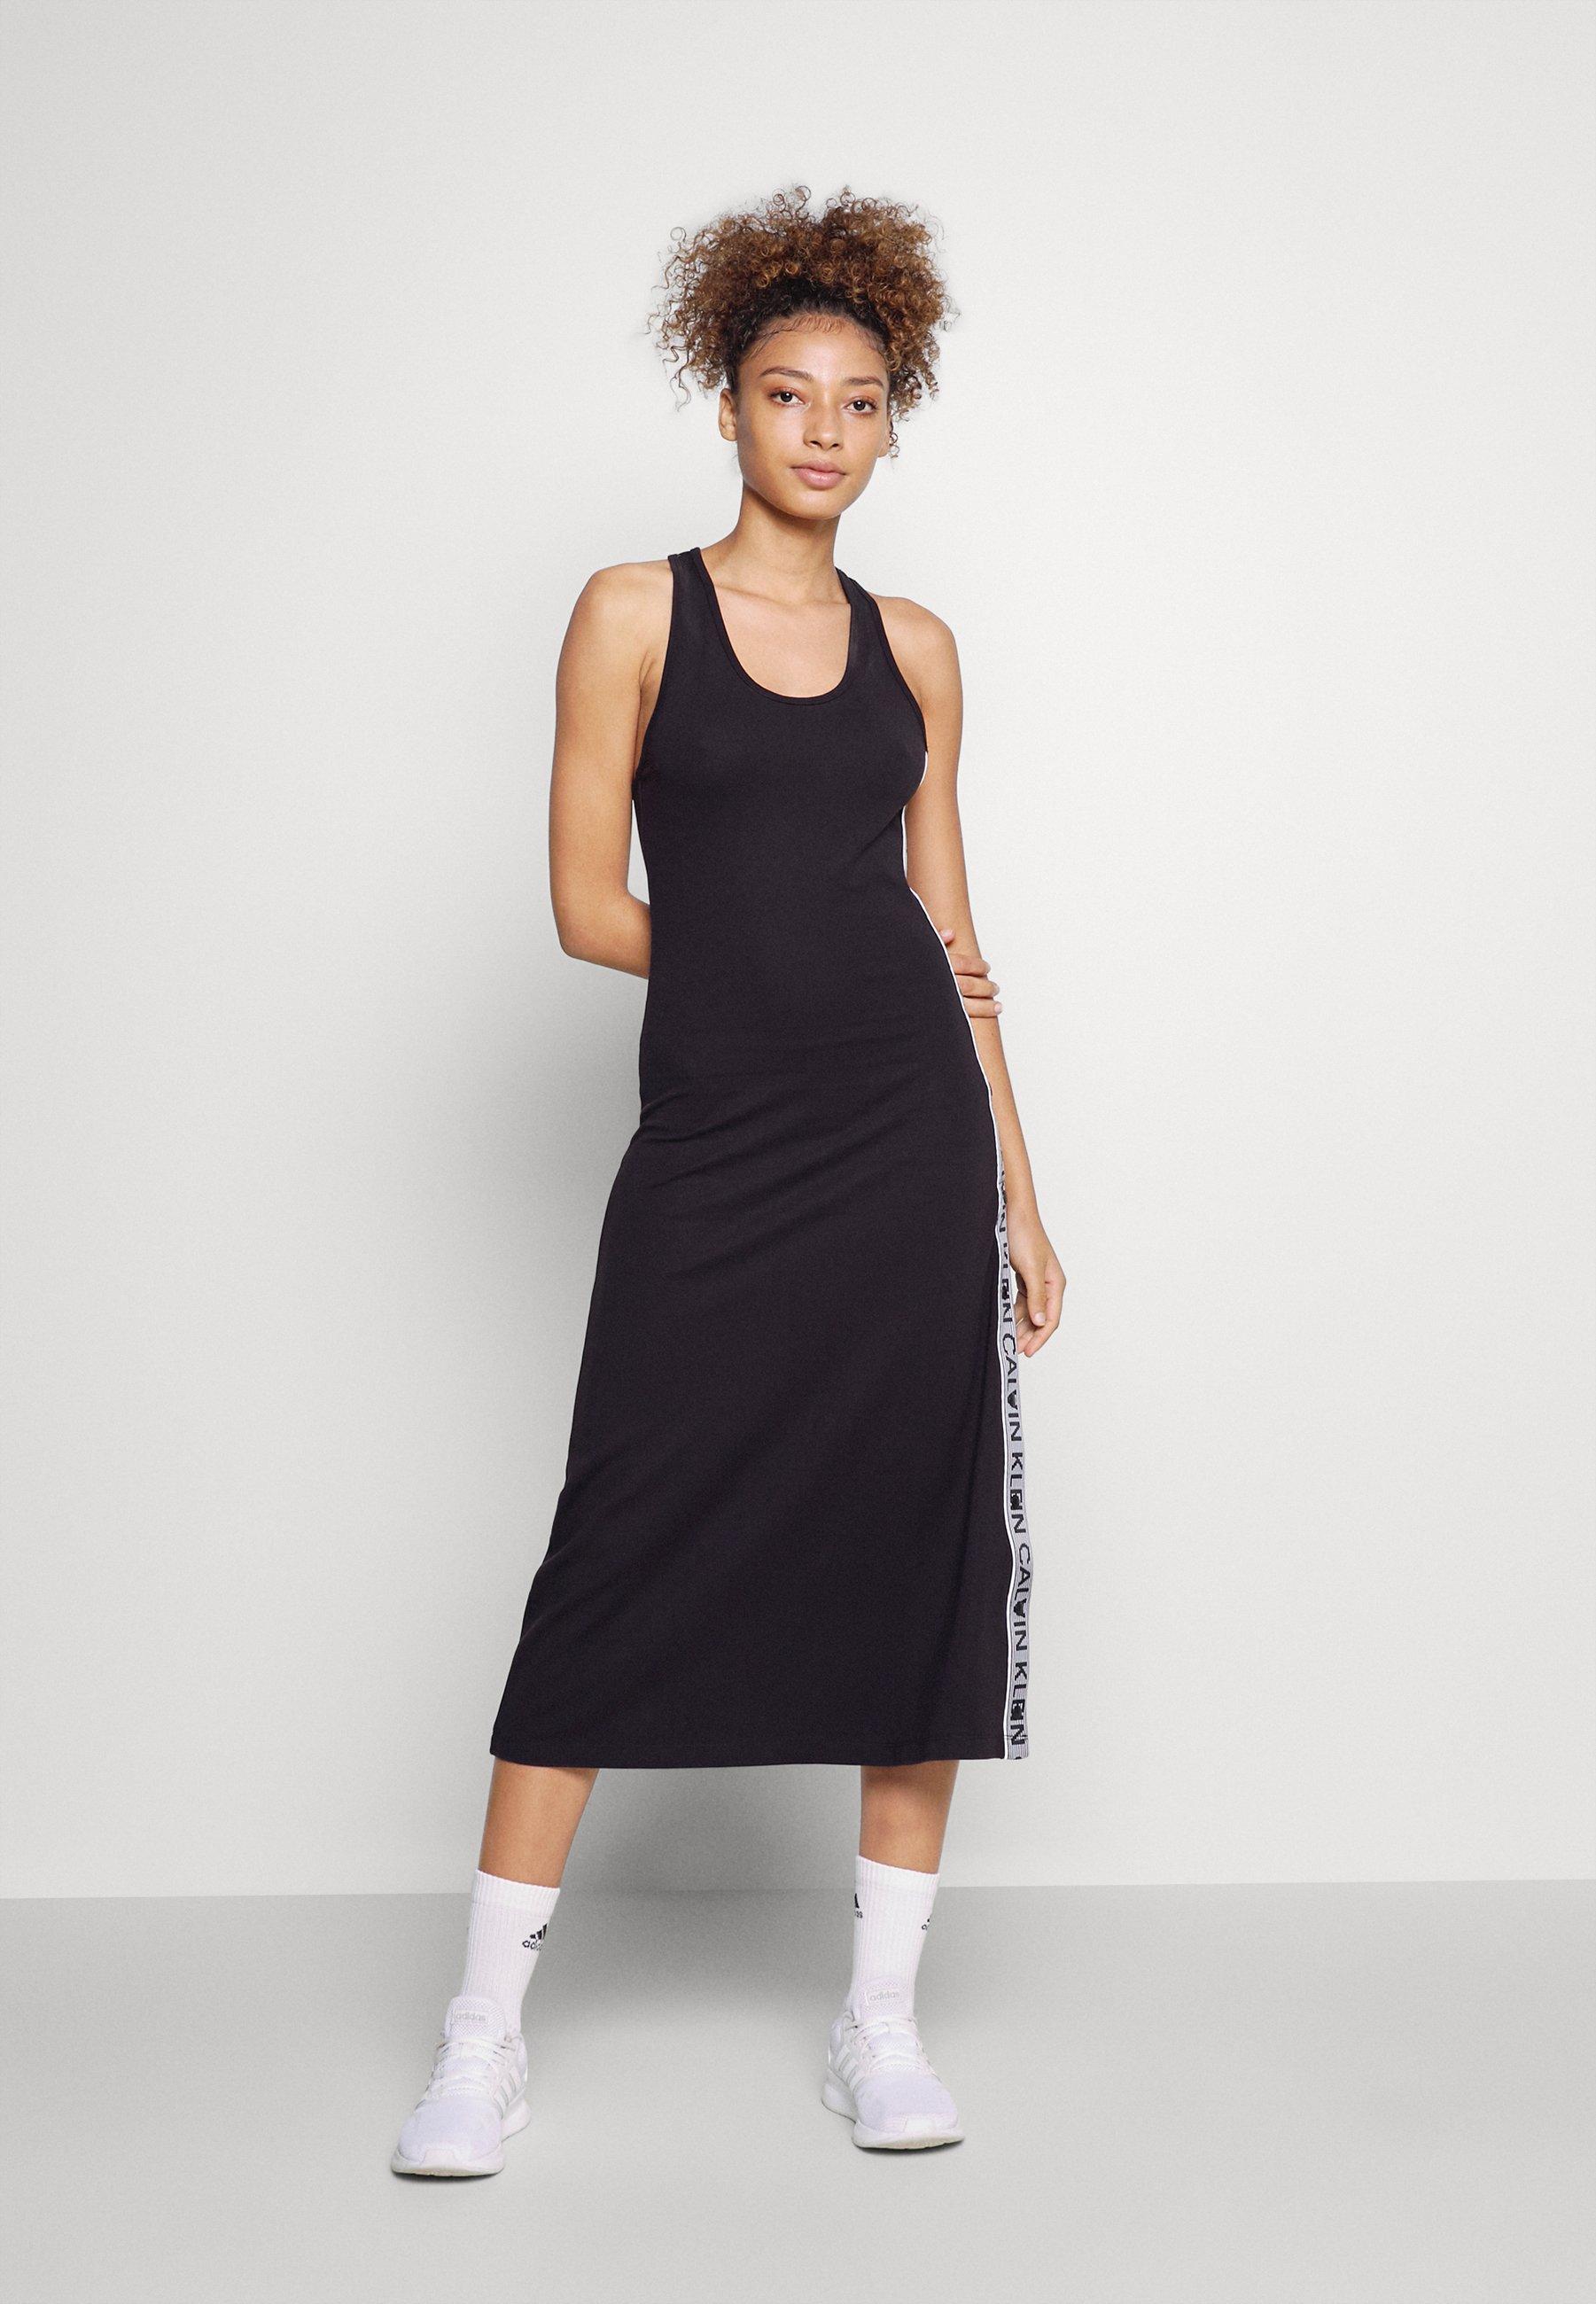 Donna LONG DRESS - Abbigliamento sportivo